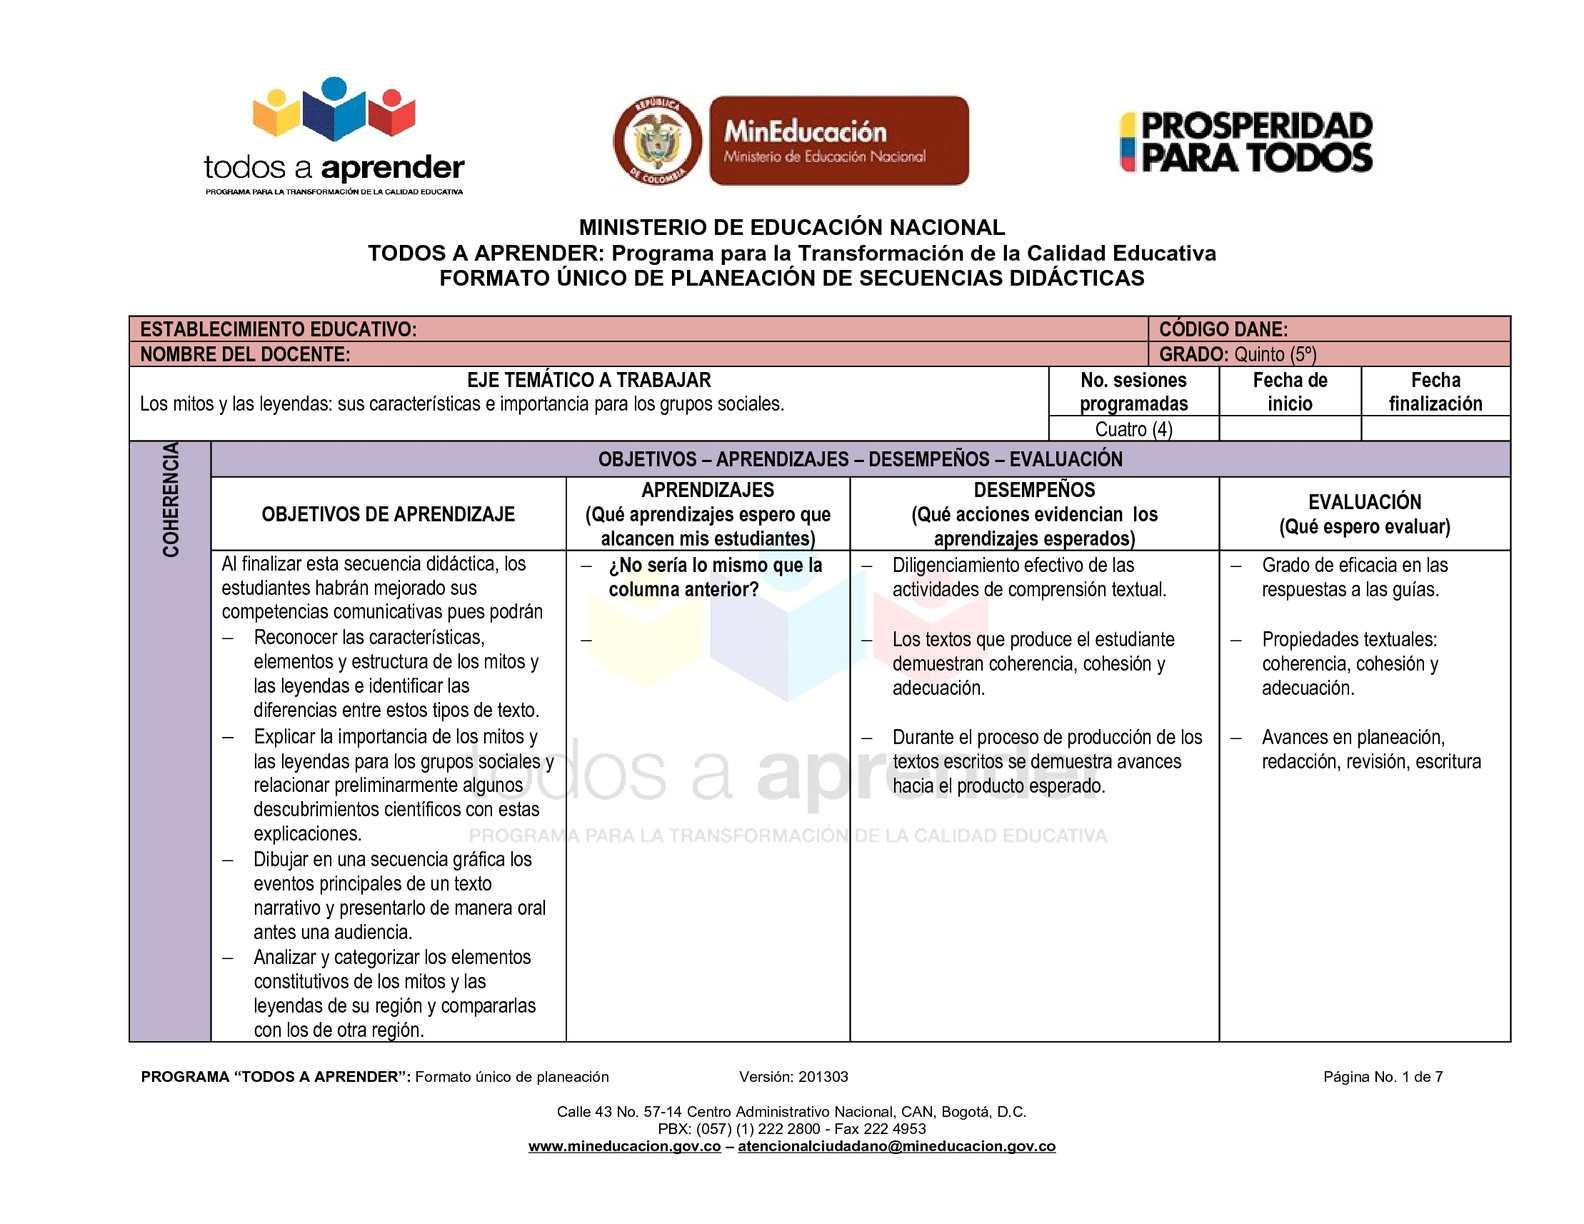 Calaméo - FORMATO ÚNICO DE PLANEACION - SECUENCIAS DIDACTICAS